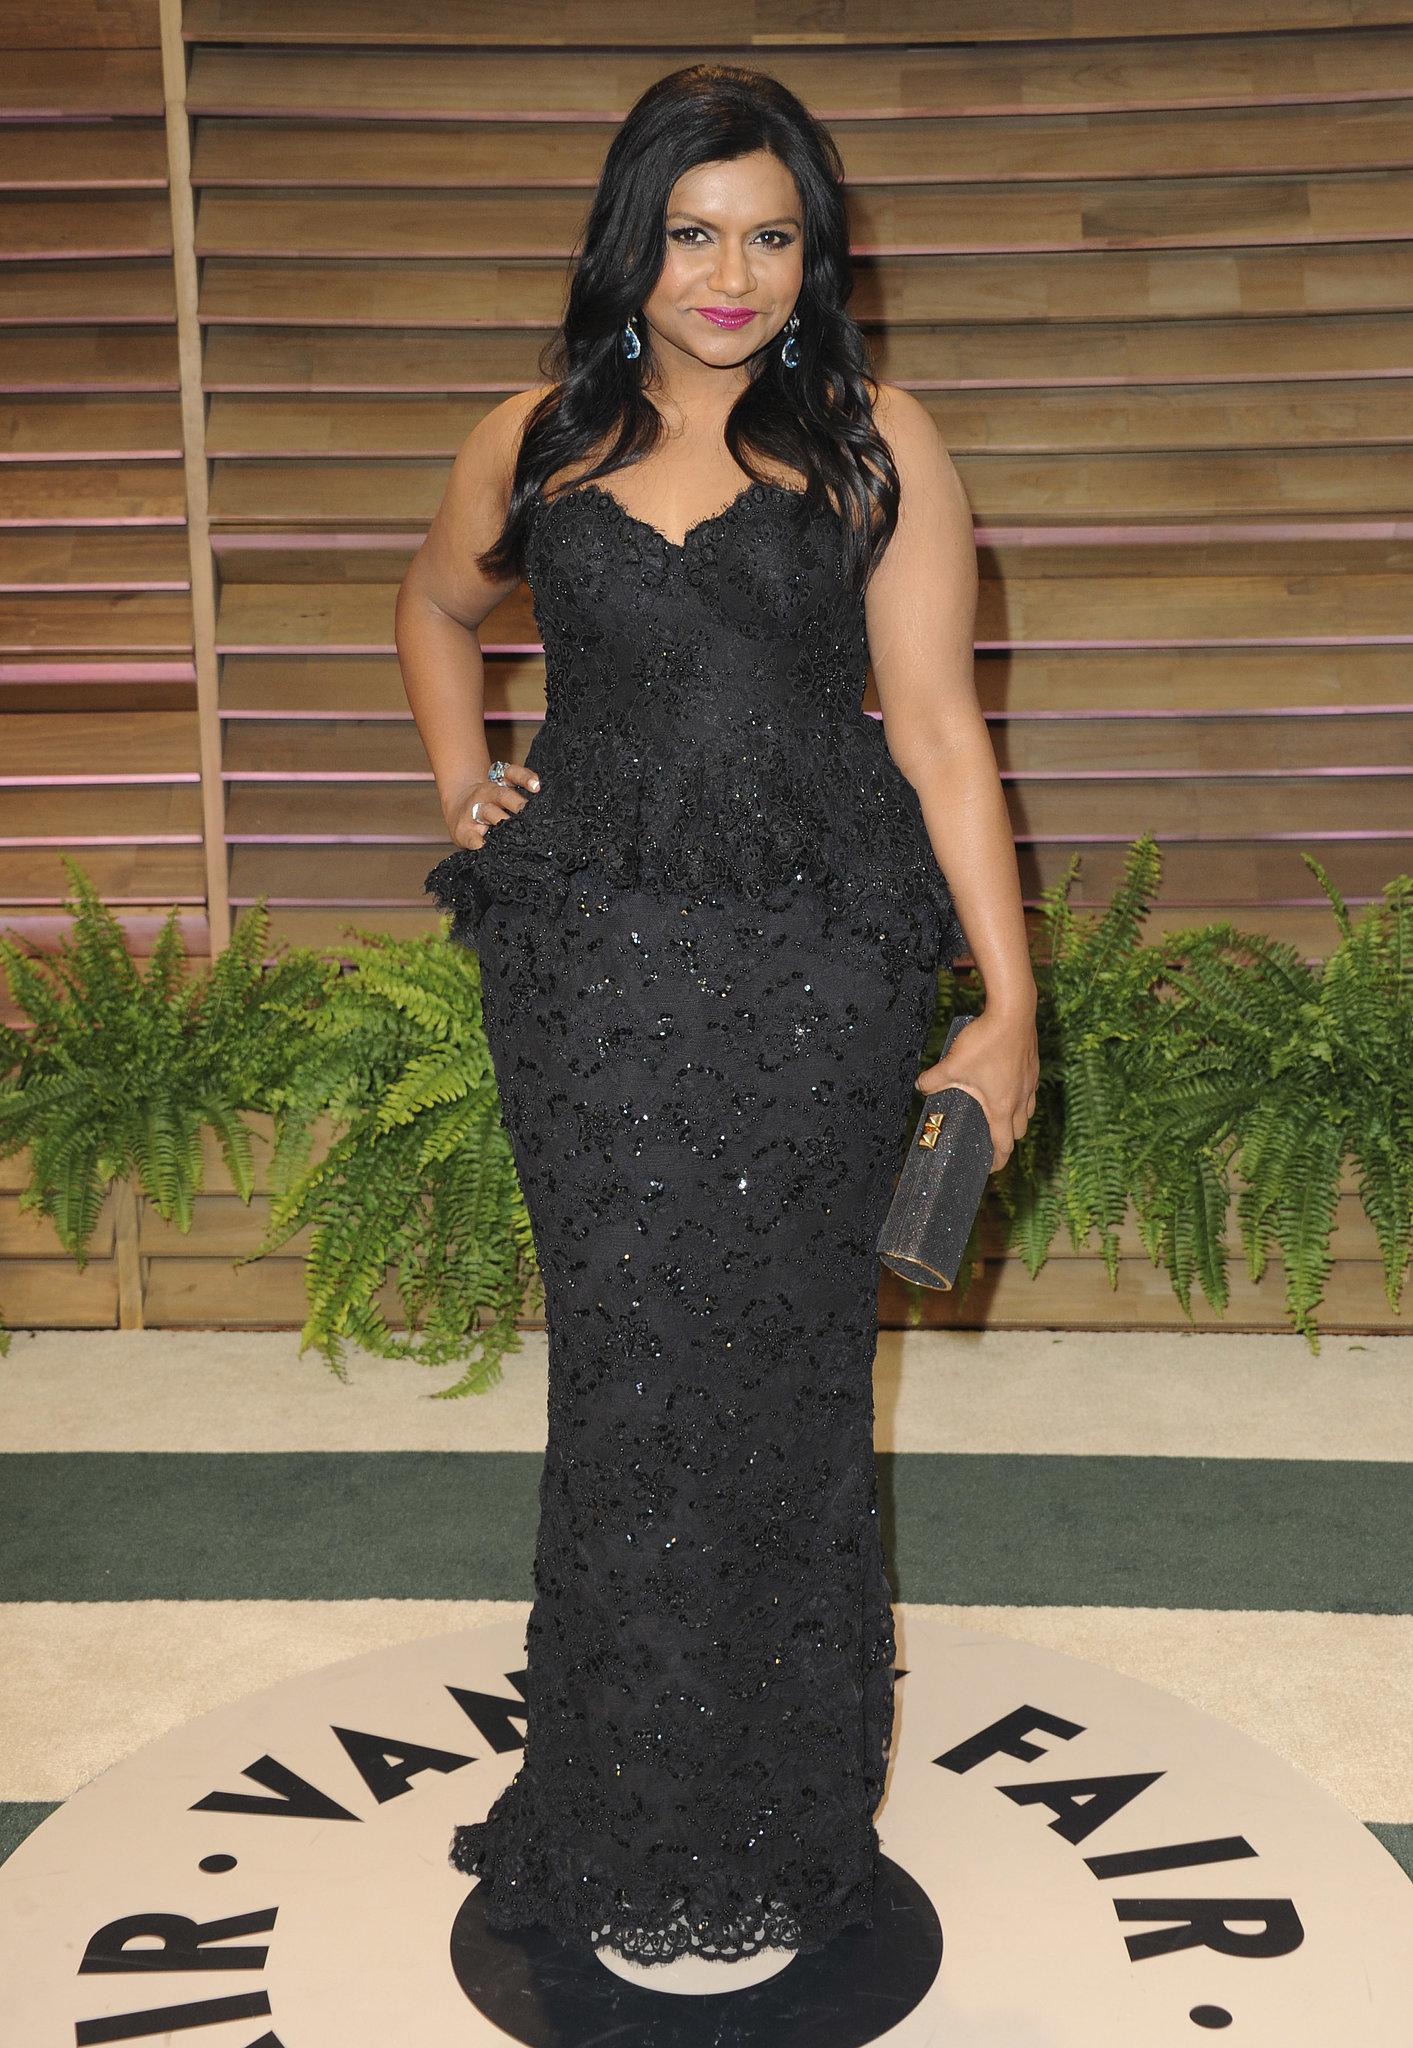 Mindy Kaling walked the carpet in a curve-hugging black dress.